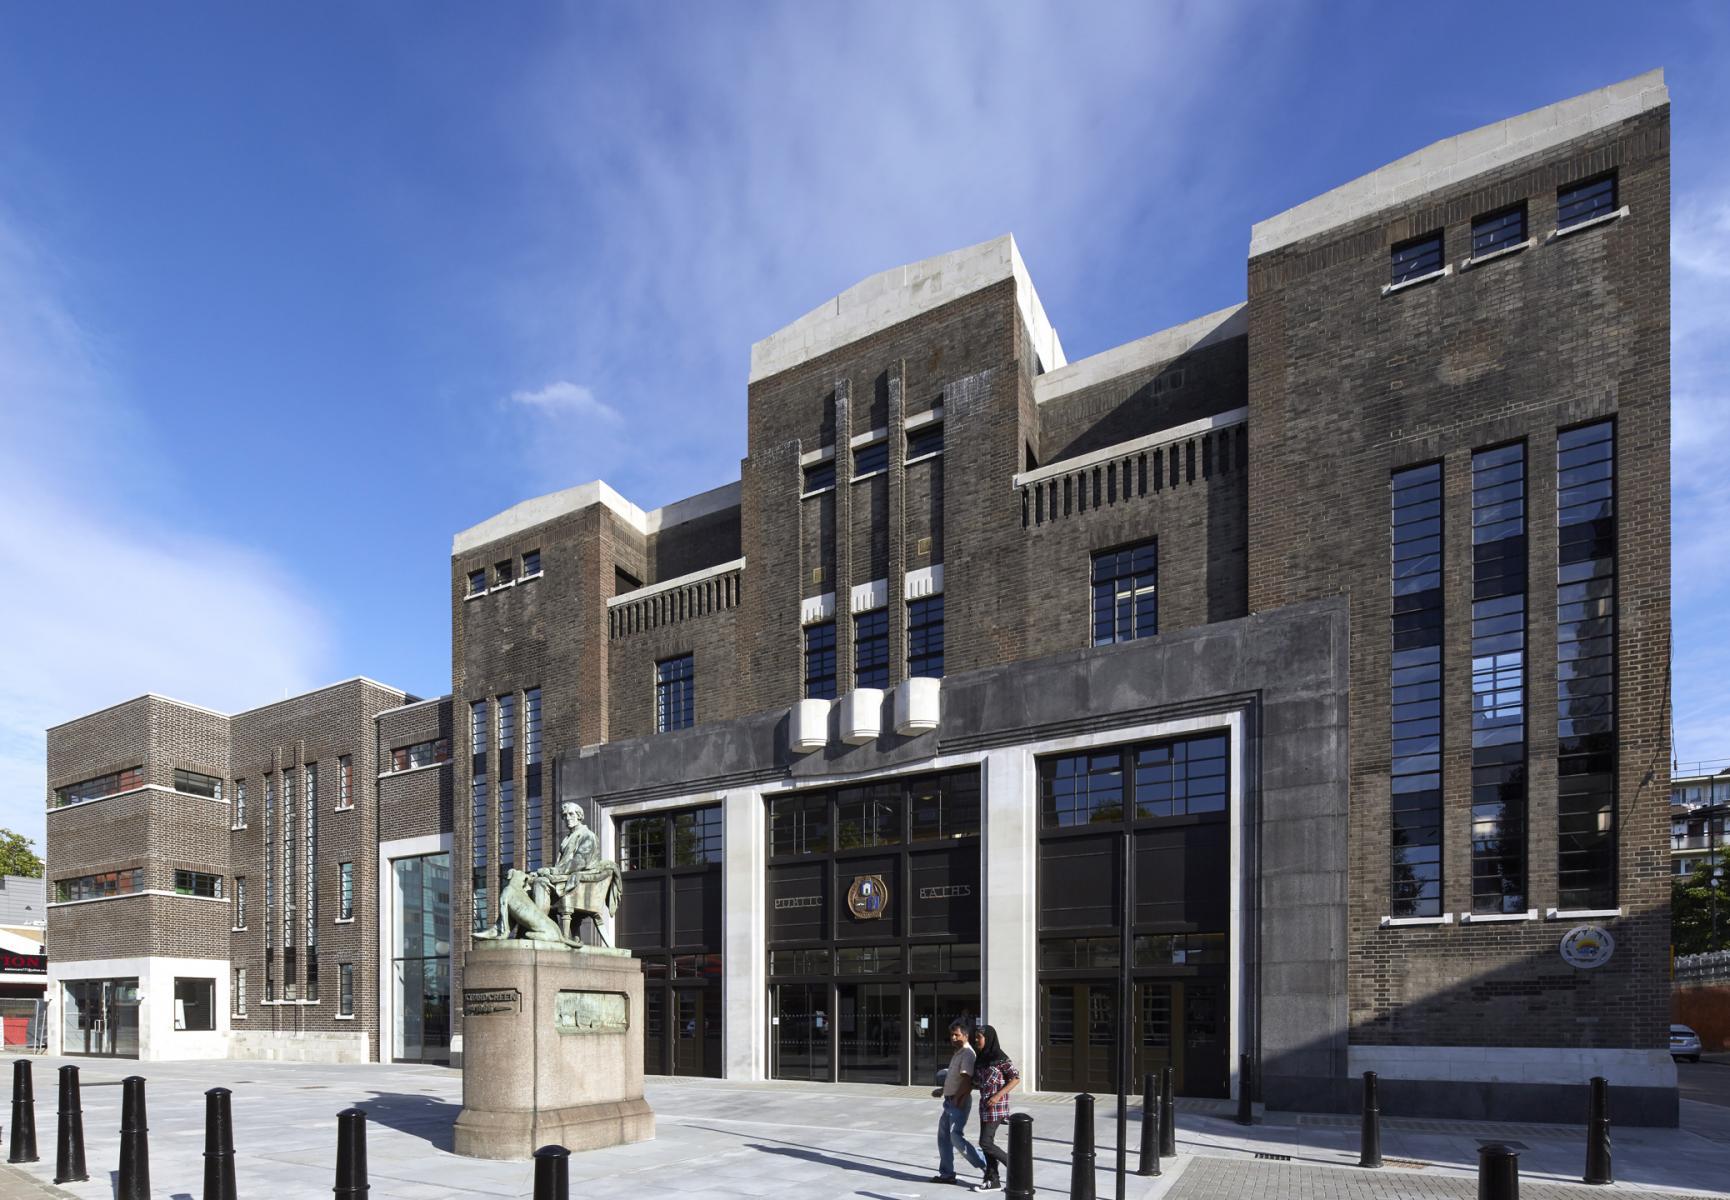 Poplar Baths Leisure Centre | PRS Architects